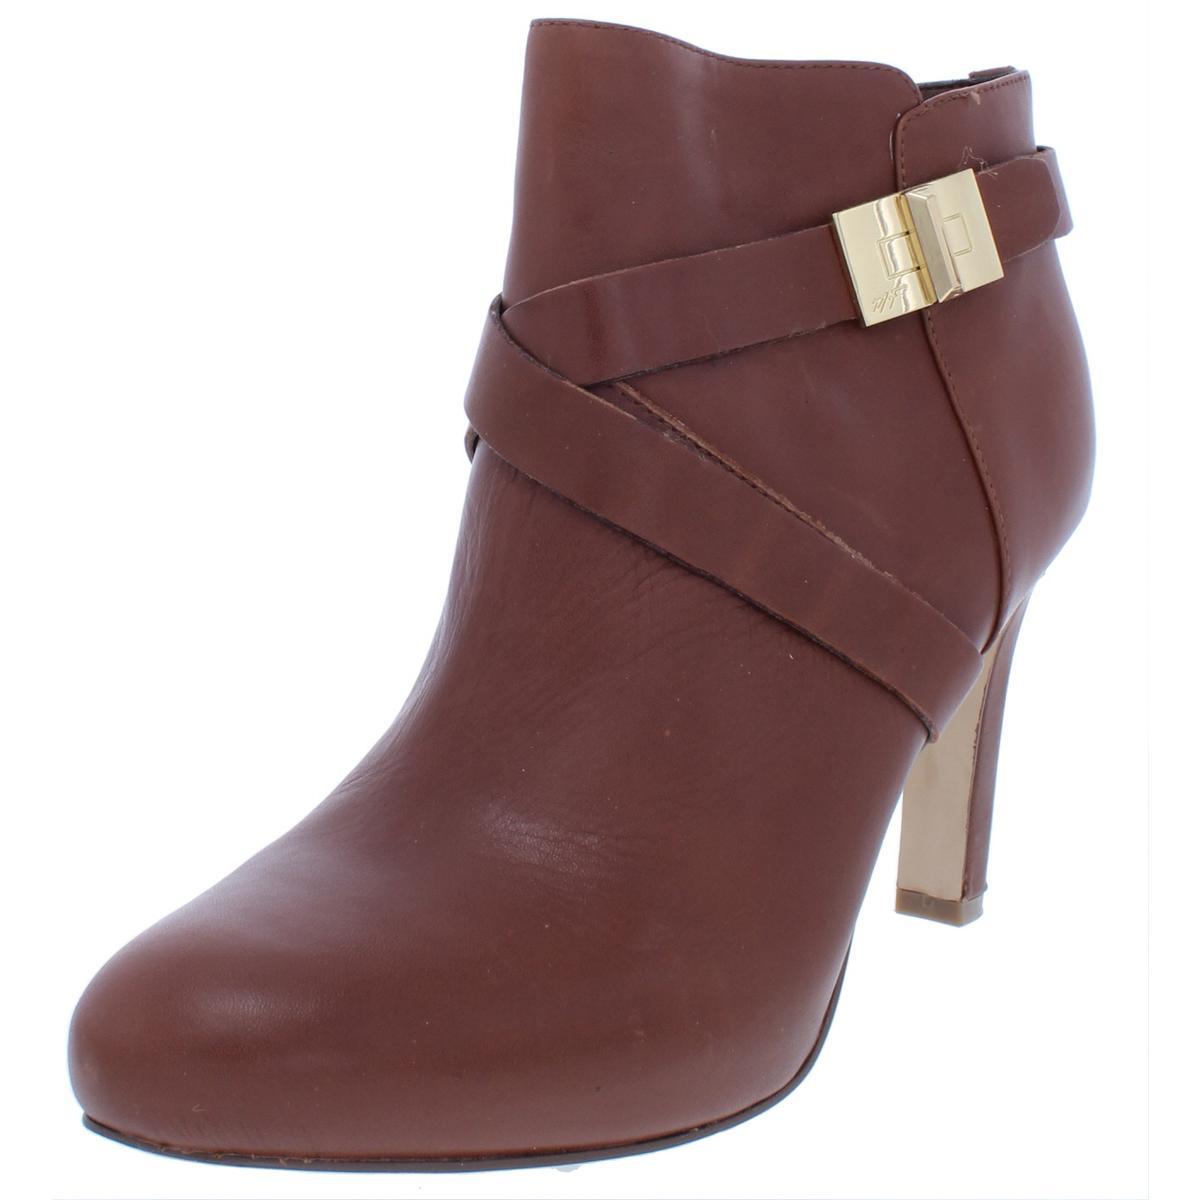 Marc Fisher Womens Orlanda Brown Leather Booties Heels 9 Medium (B,M) BHFO 6081